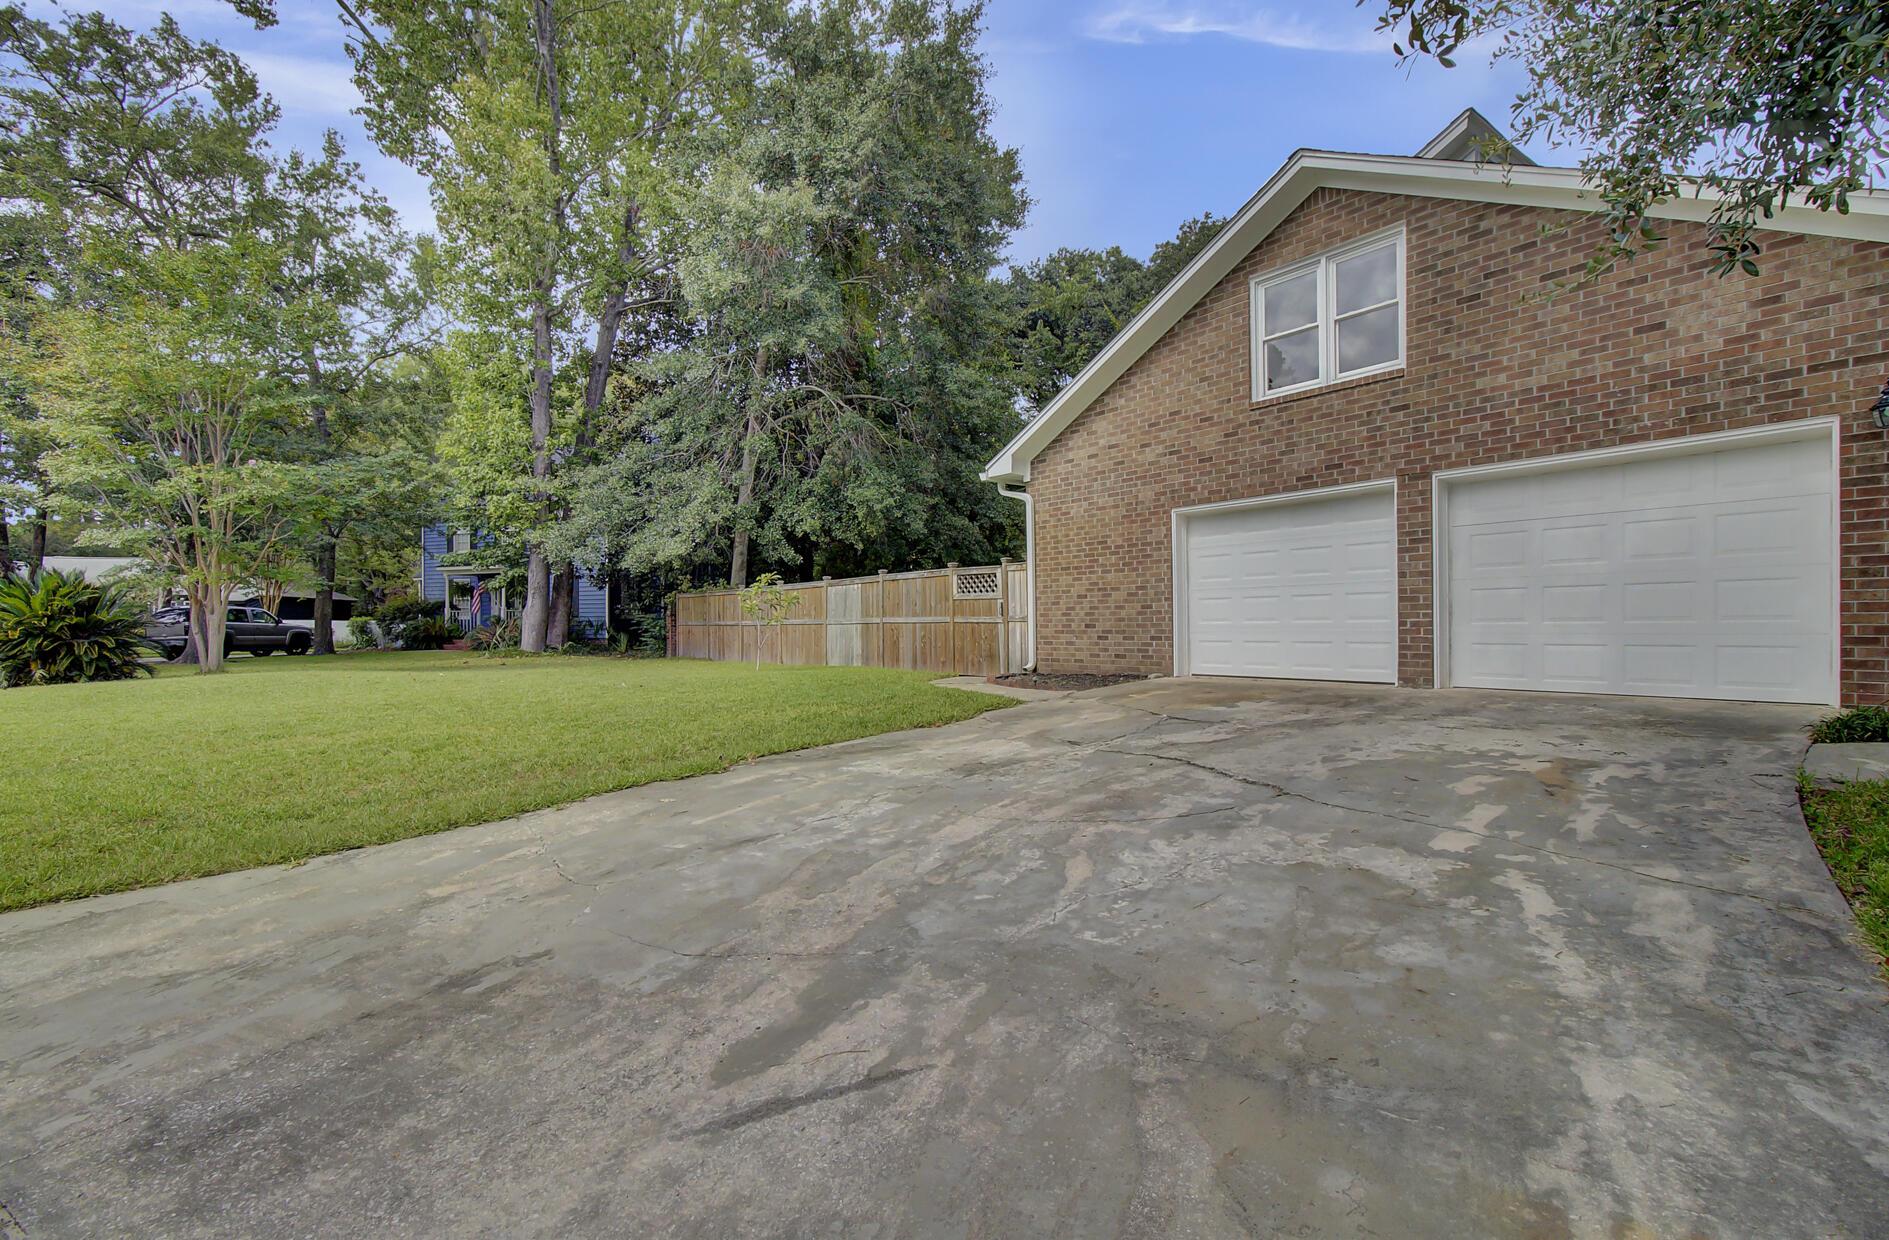 Snee Farm Homes For Sale - 1137 Parkway, Mount Pleasant, SC - 18